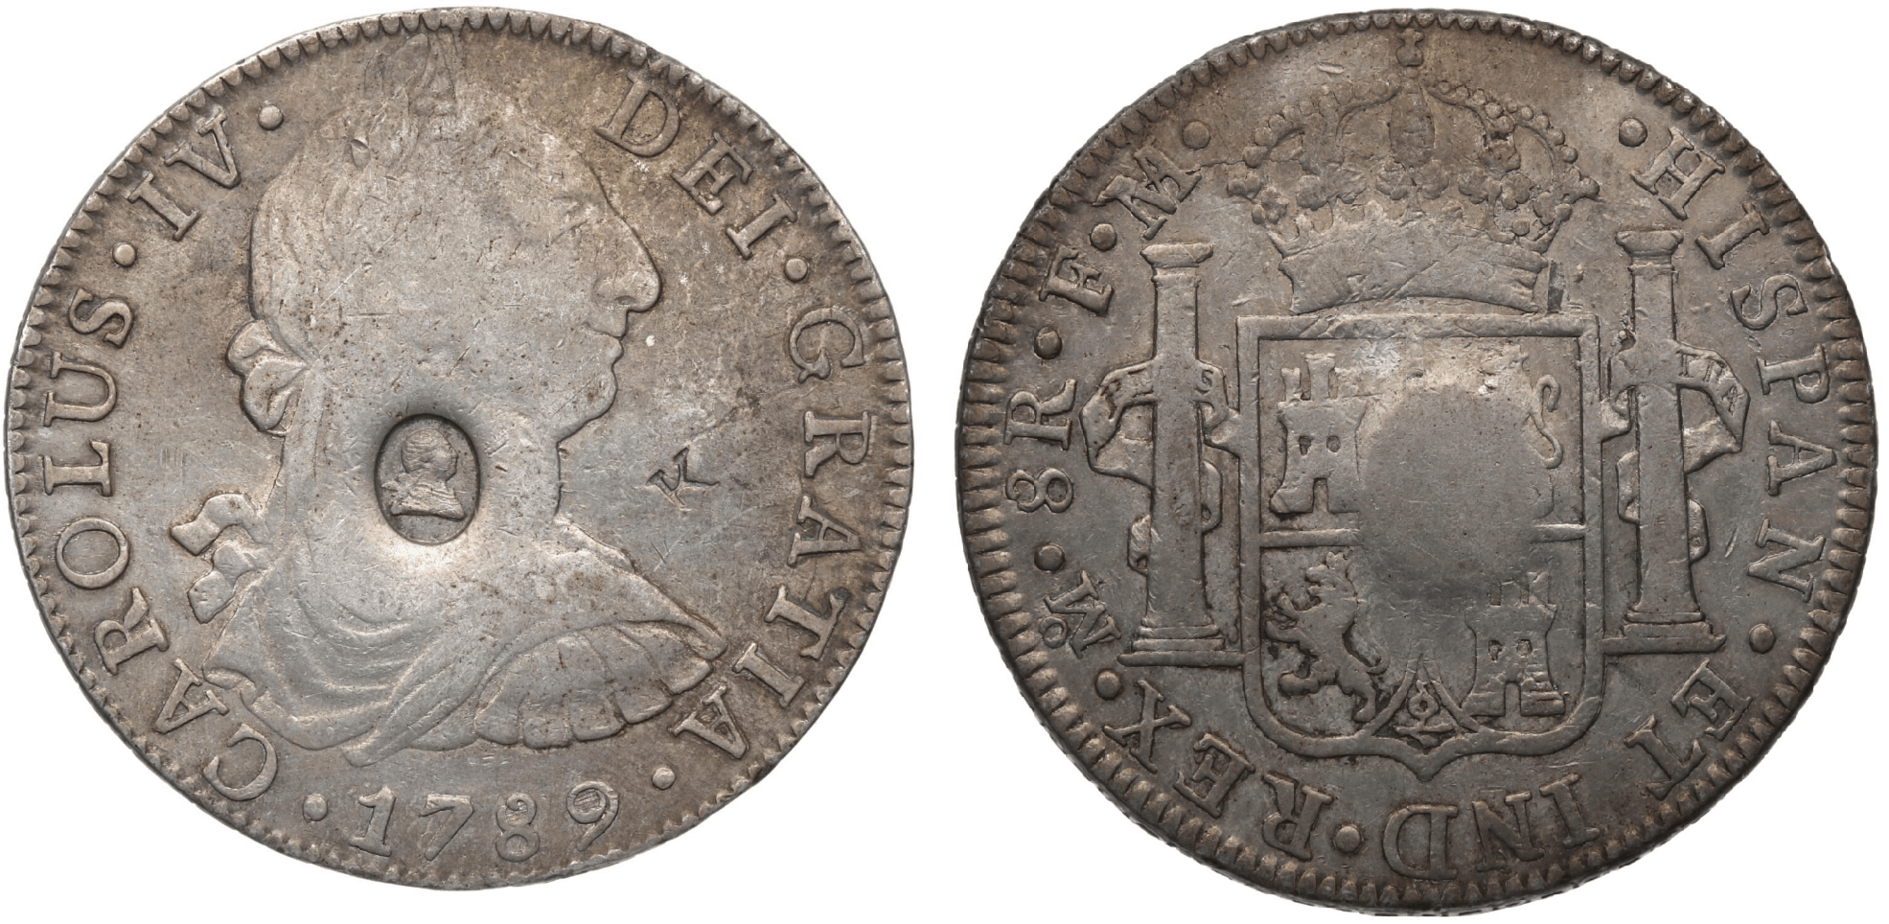 8 reales México 1789, resello de Jorge III